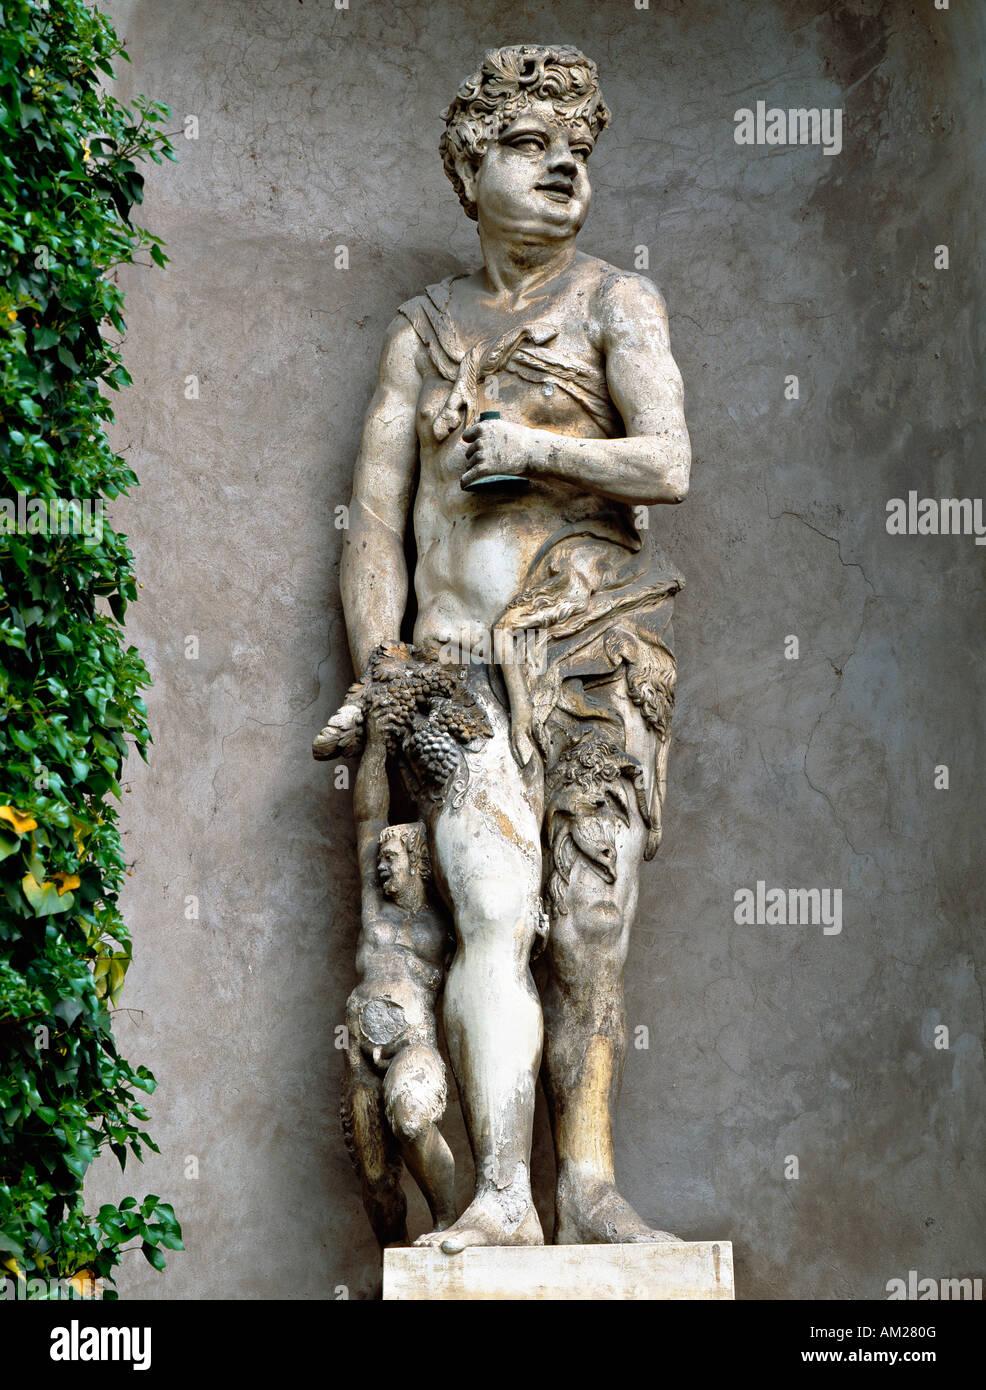 The Renaissance gardens of the Giardino Giusti, Verona, Italy. Statue of the Roman god Bacchus - Stock Image